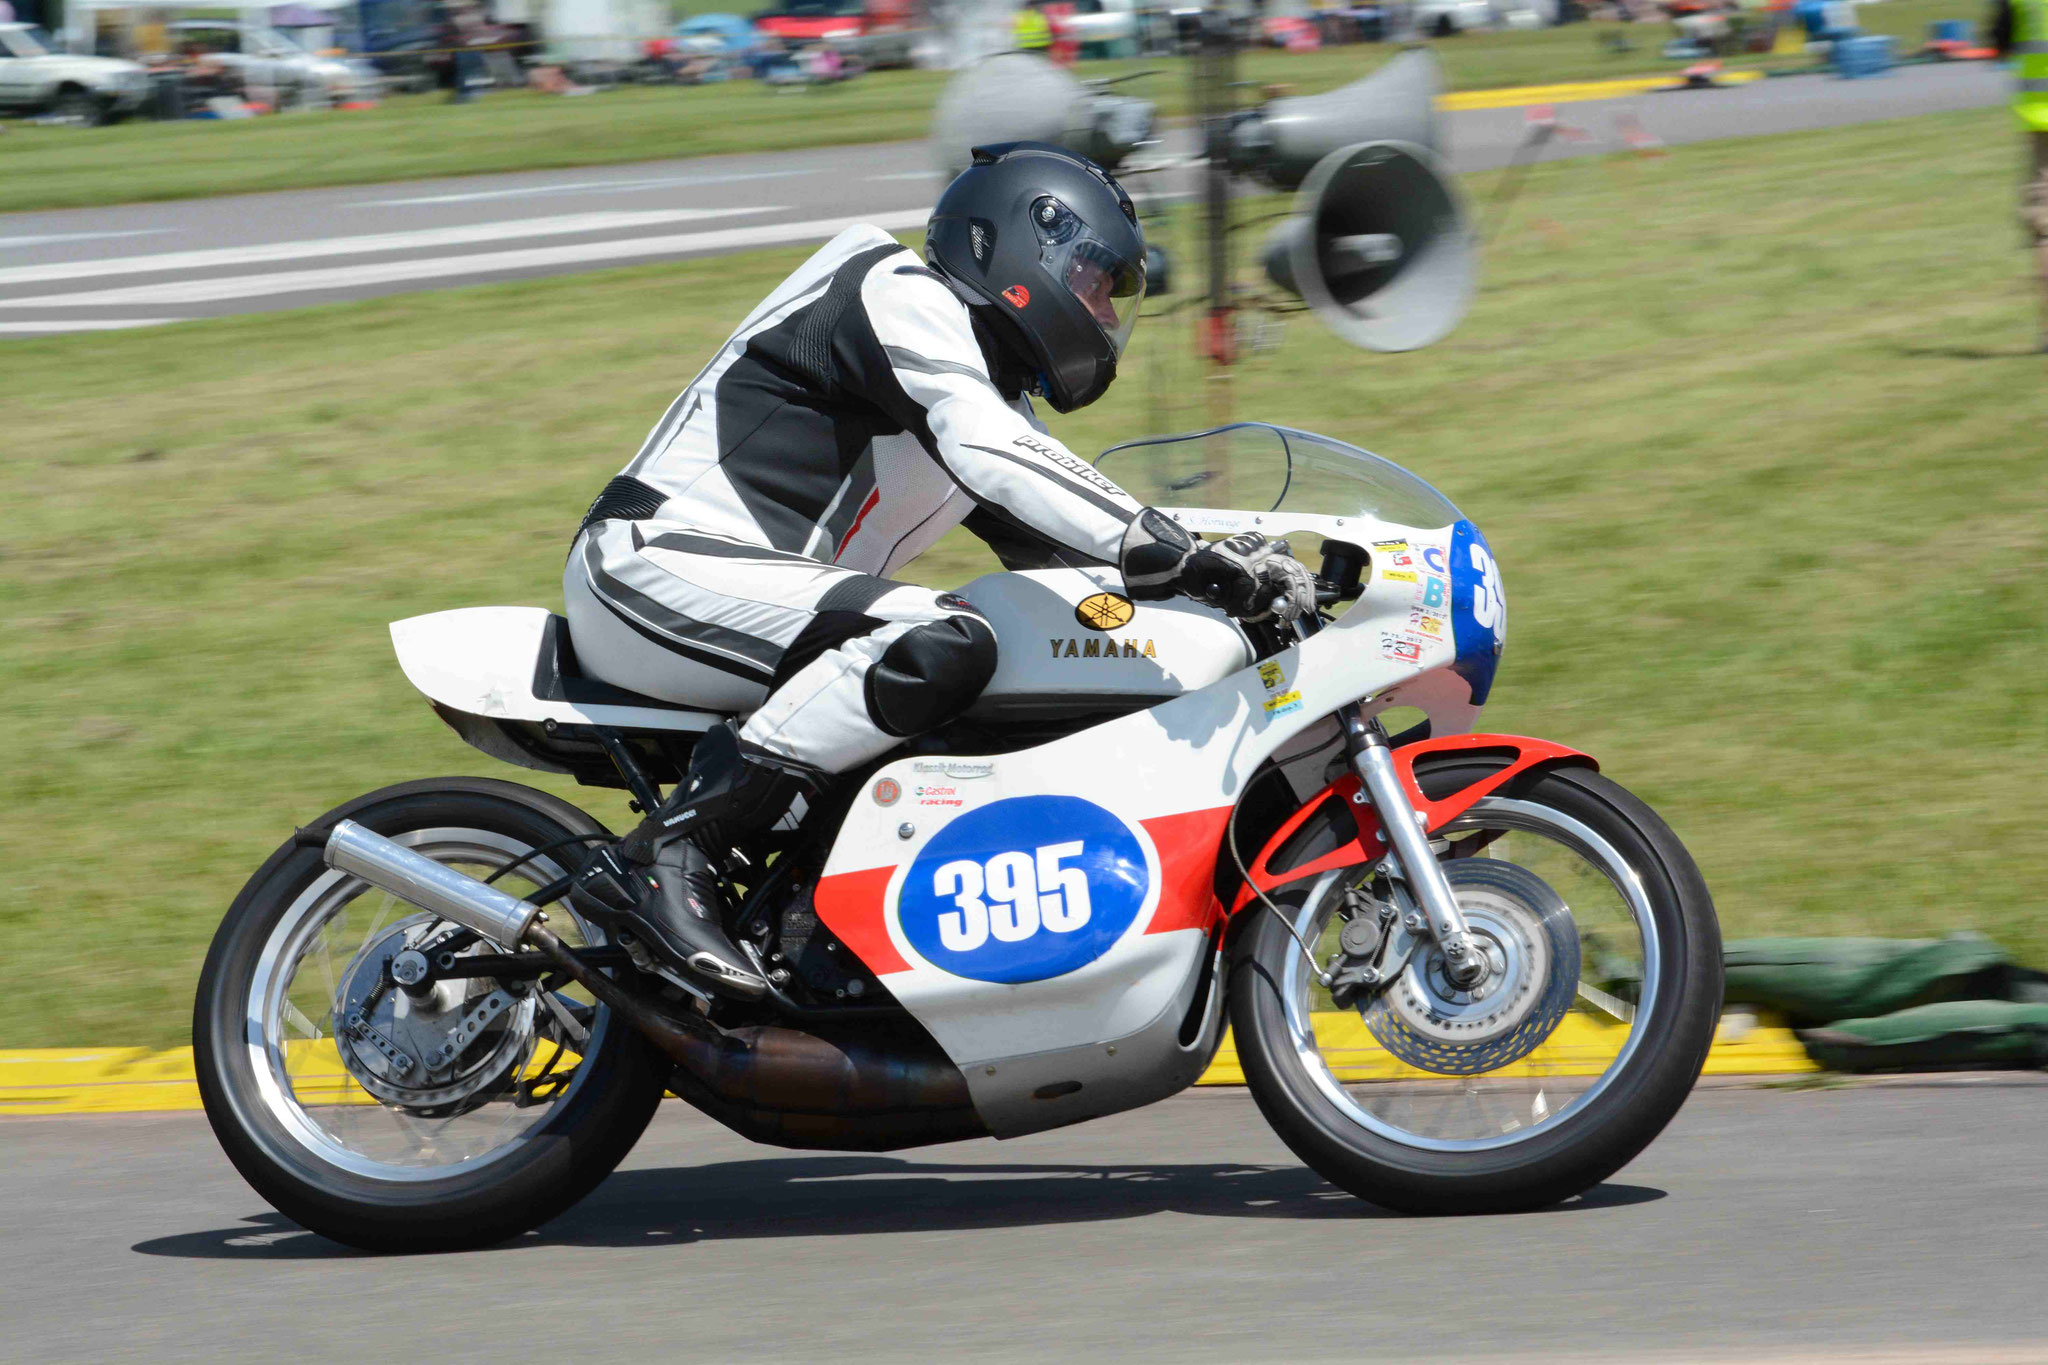 Stefan Horwege / Spondon-Yamaha TZ350 1979